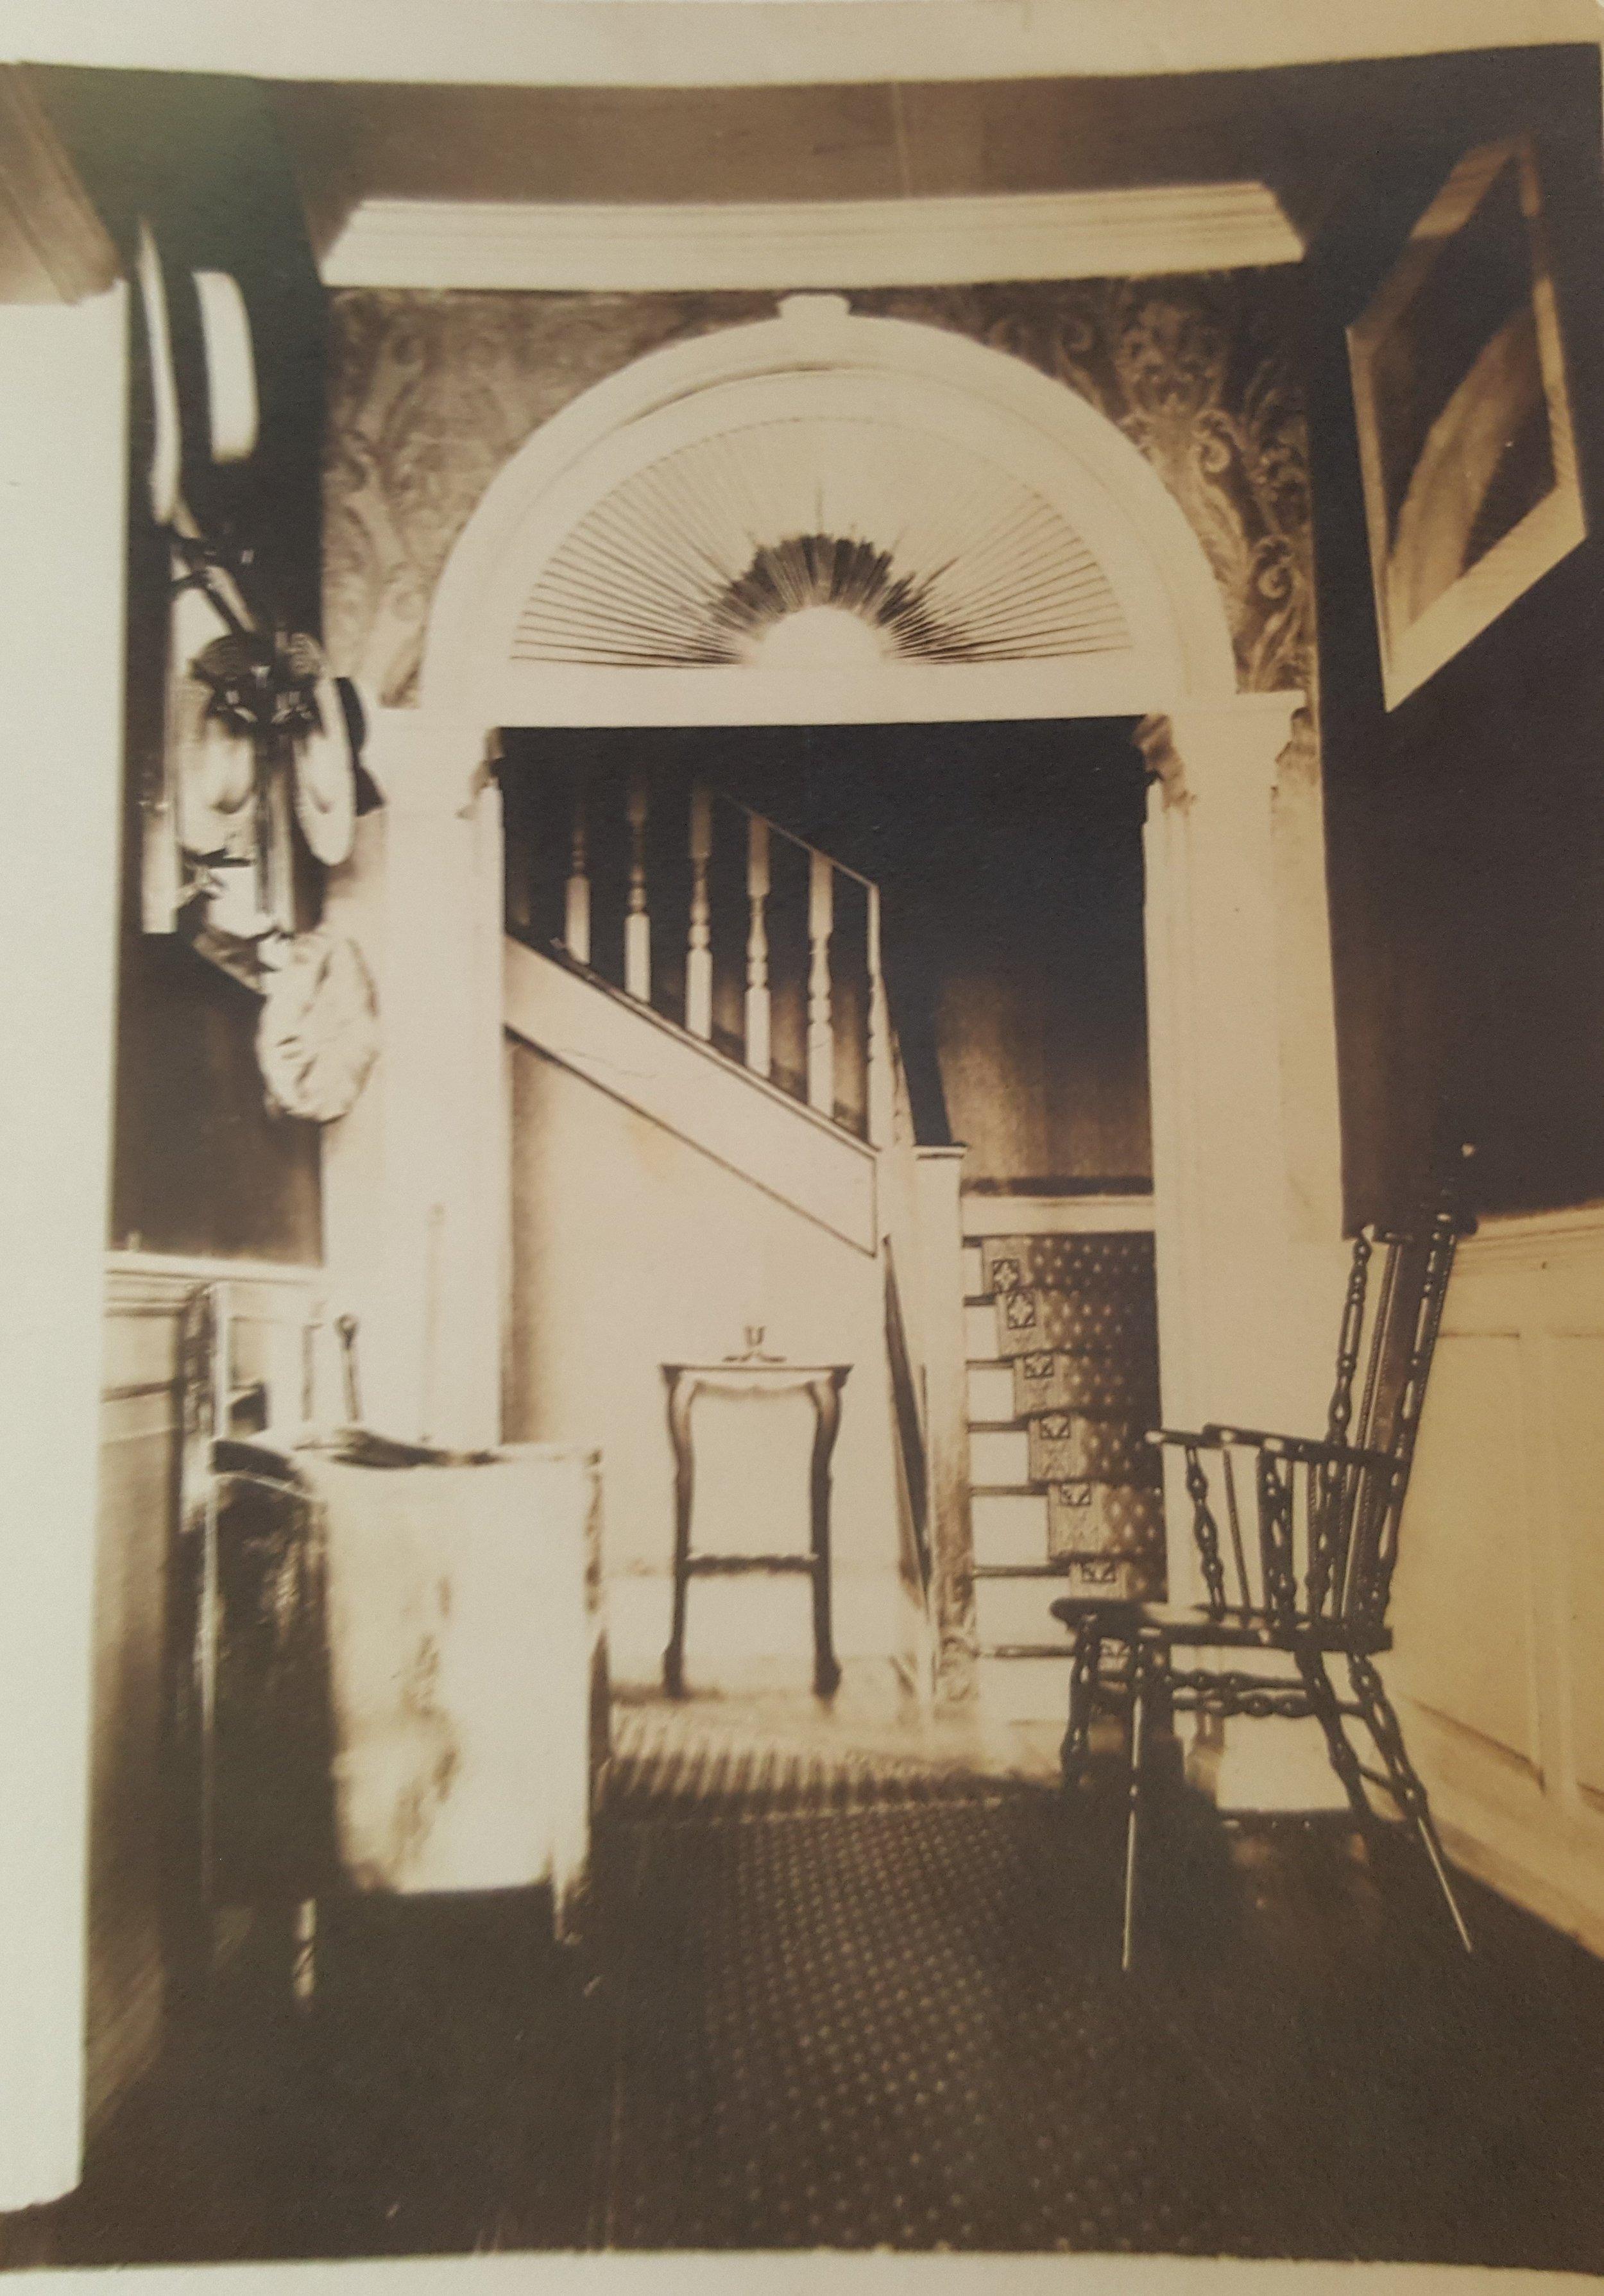 Pipin Photos undated interior.jpg